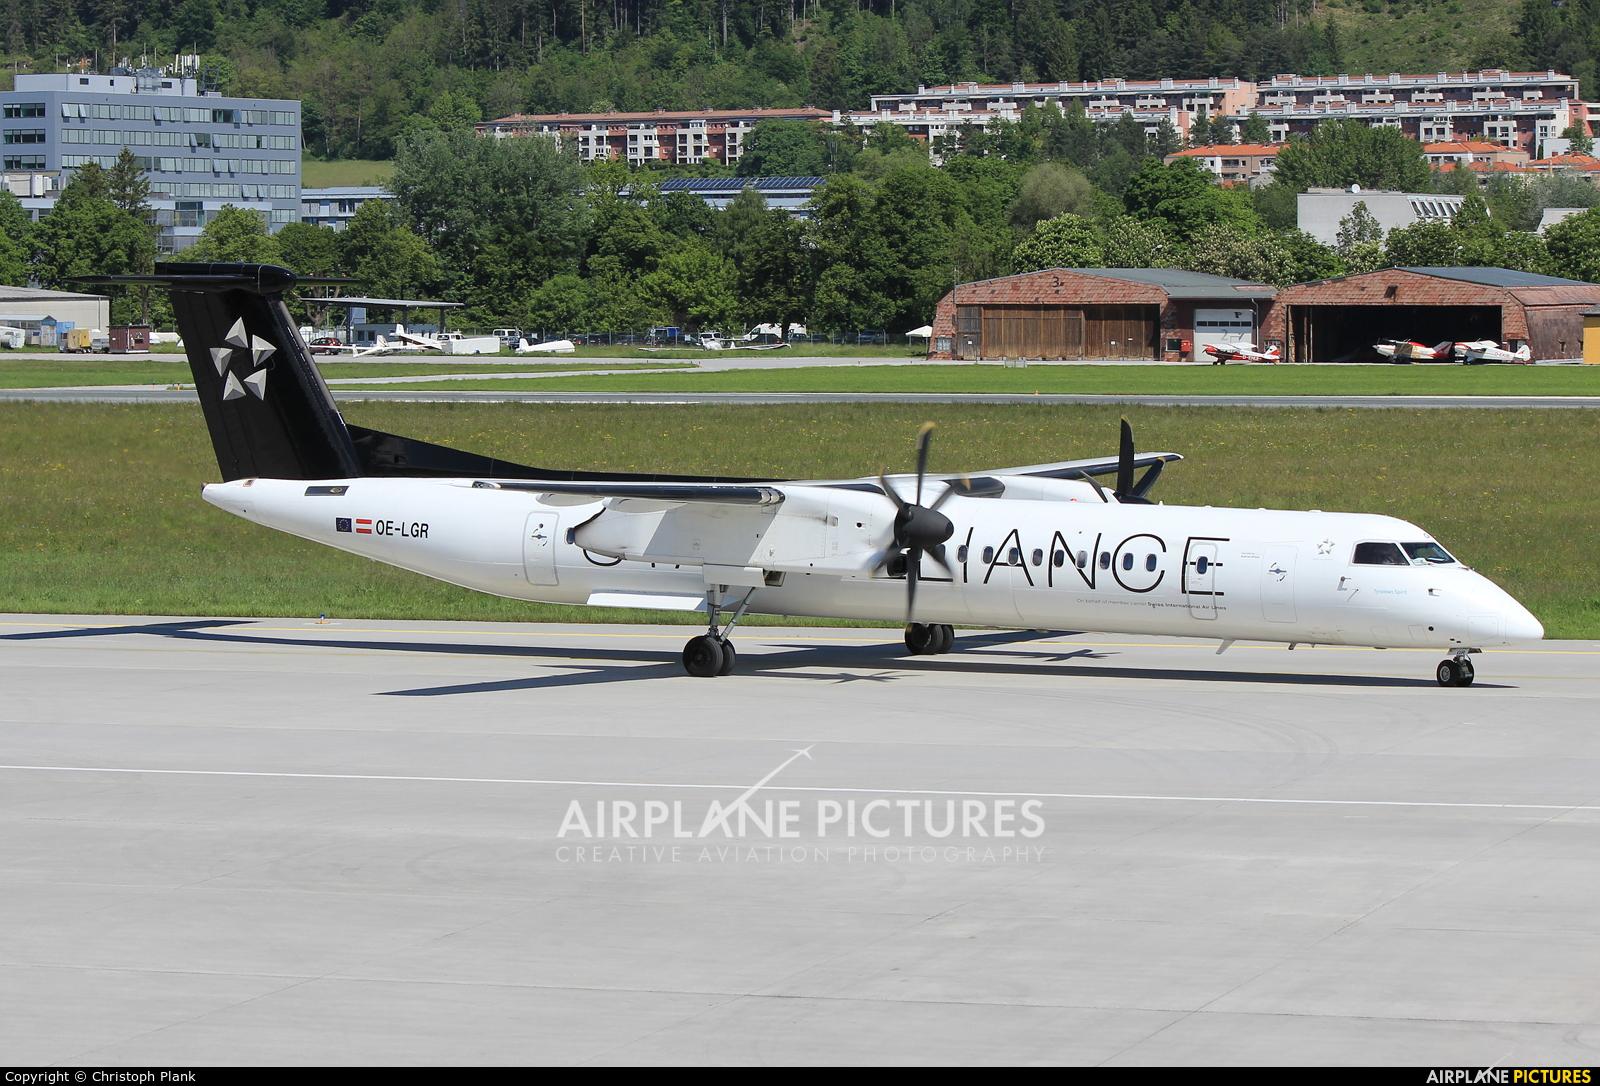 Austrian Airlines/Arrows/Tyrolean OE-LGR aircraft at Innsbruck